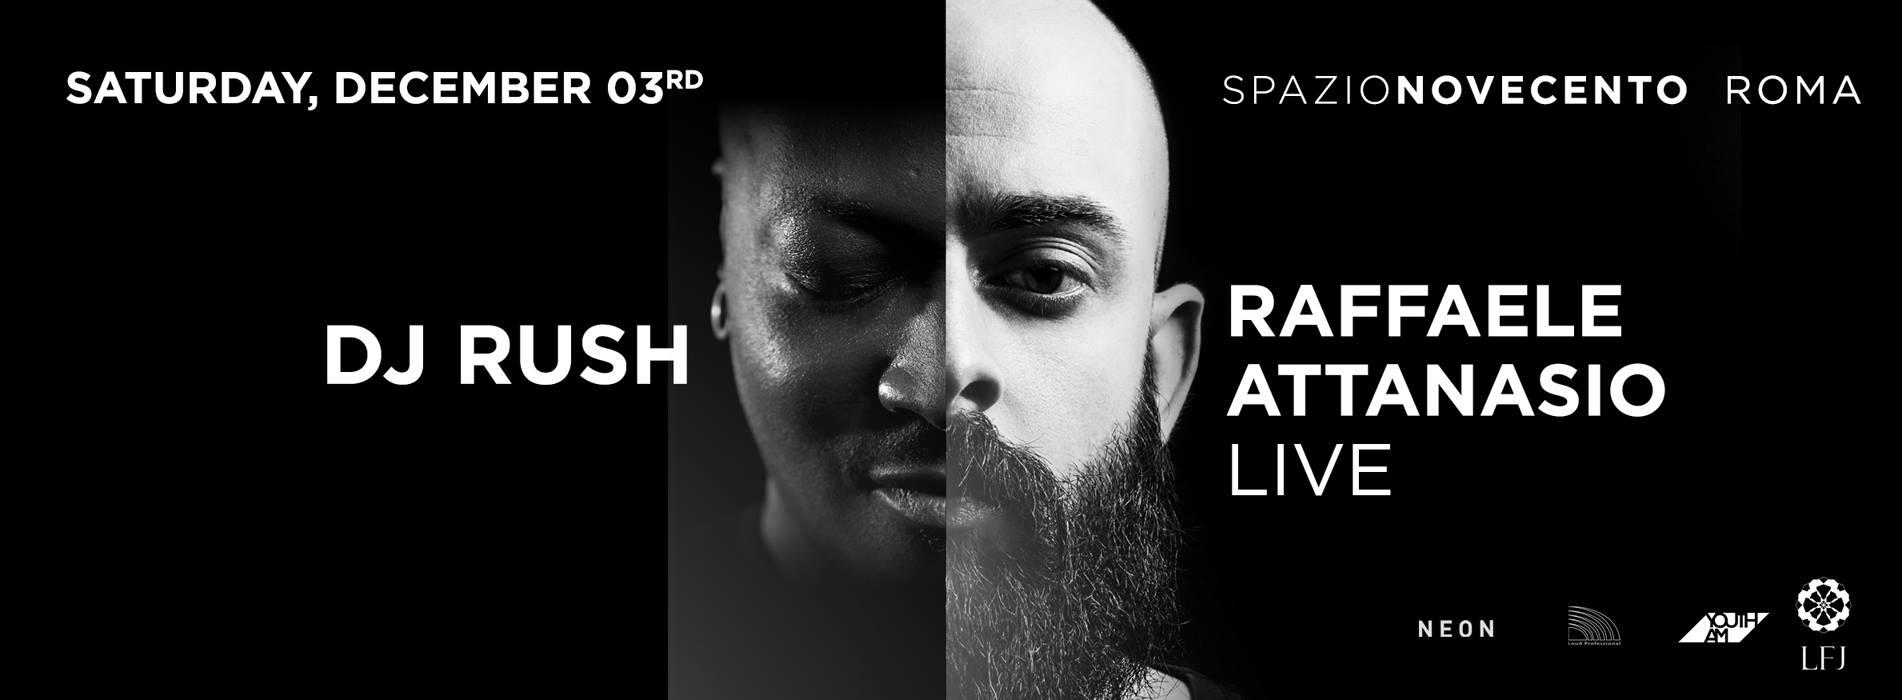 Raffaele Attanasio + Dj Rush at Spazio Novecento Roma